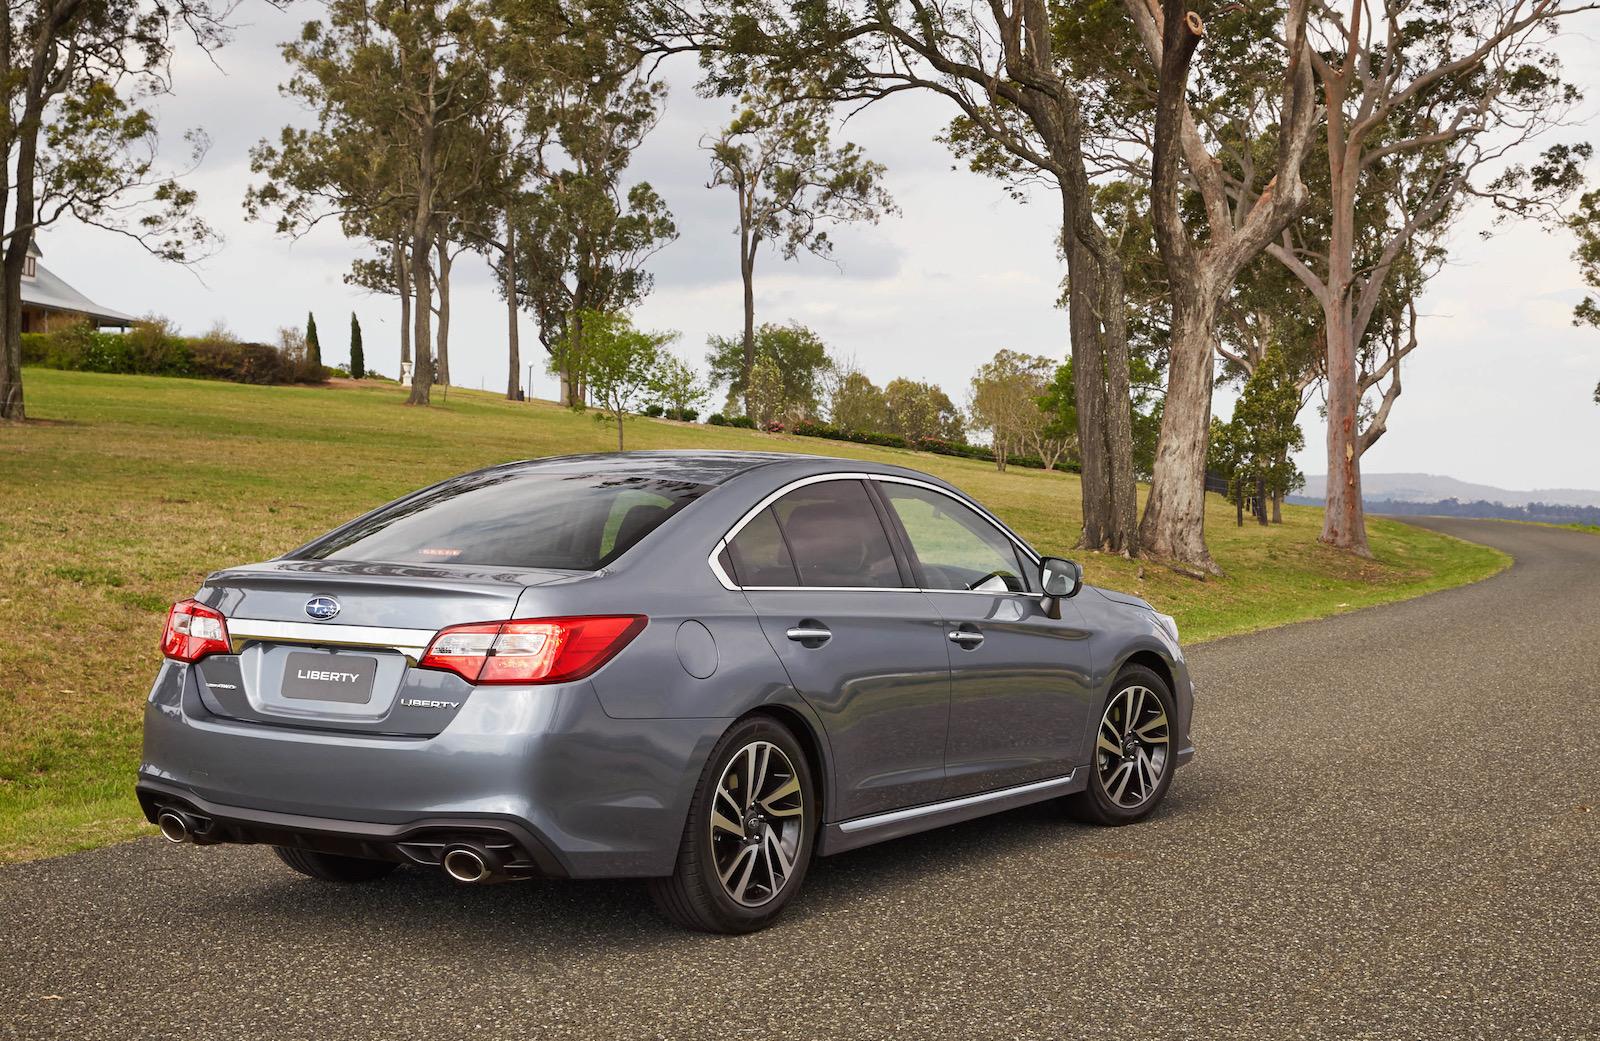 2018 Subaru Liberty update now on sale in Australia ...